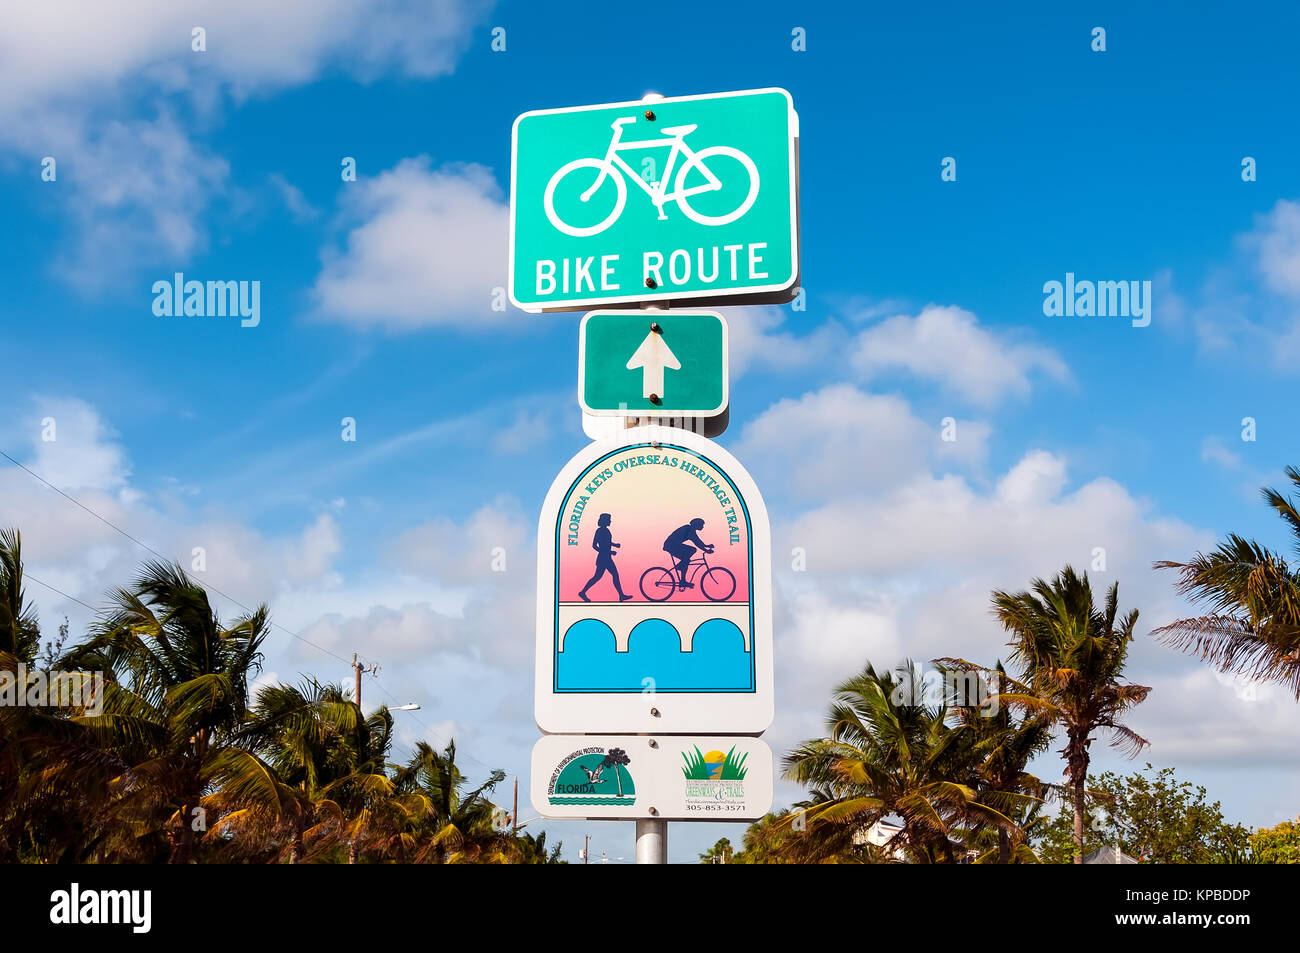 Overseas highway stock photos overseas highway stock for Key west bike trails